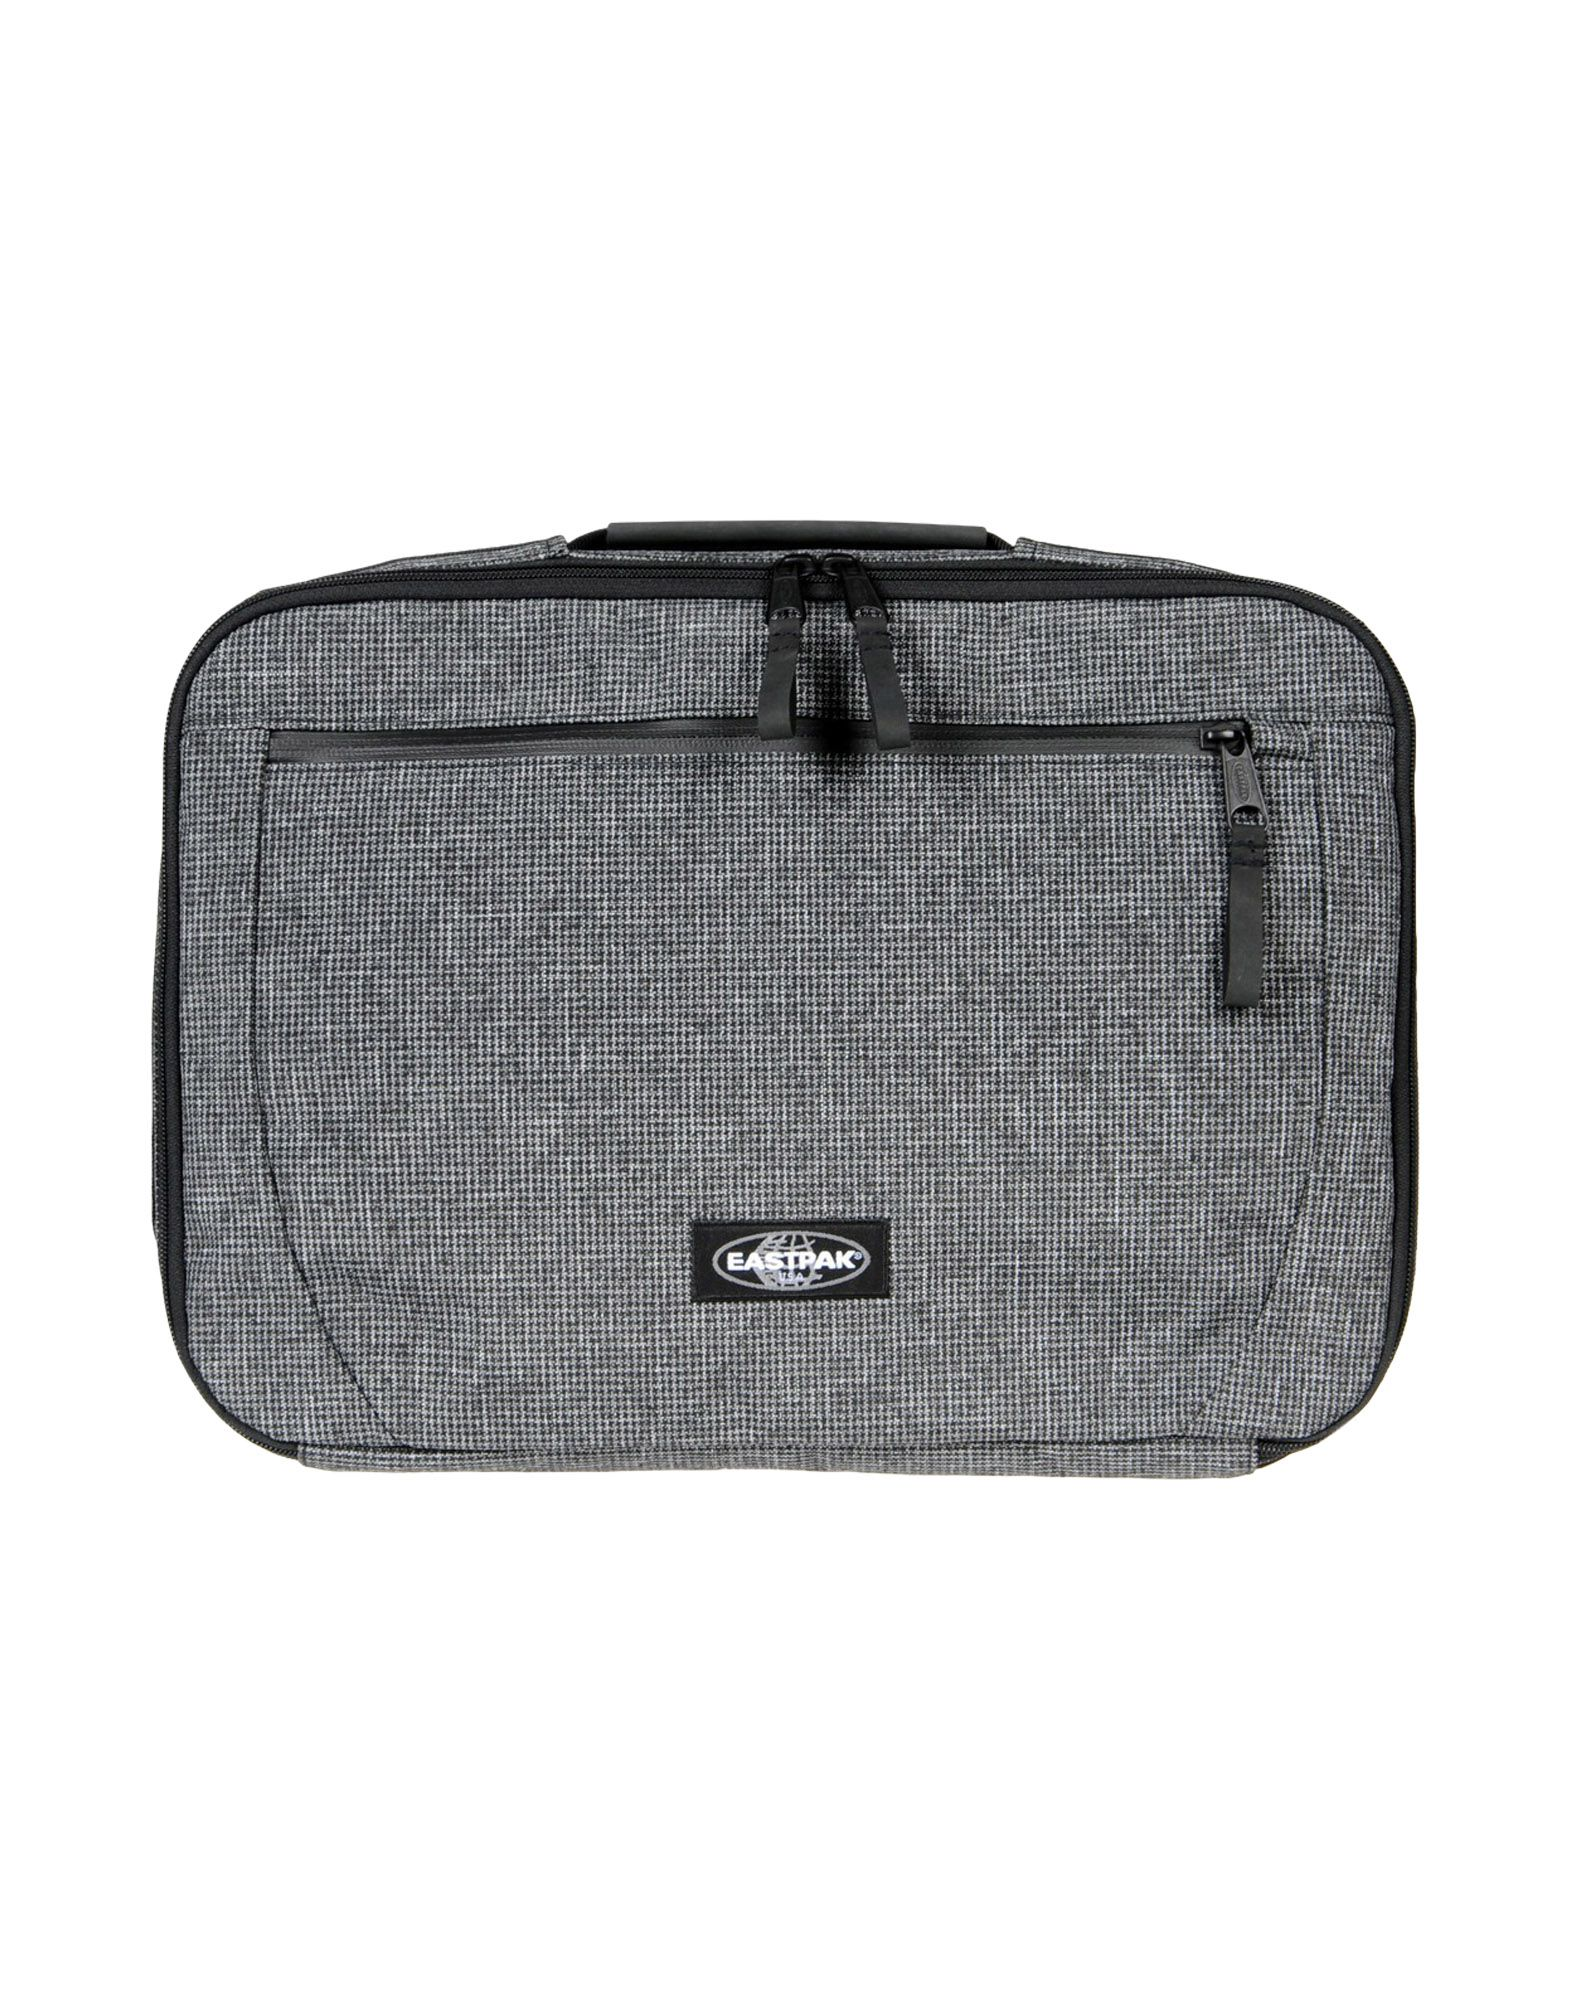 EASTPAK Деловые сумки orciani деловые сумки